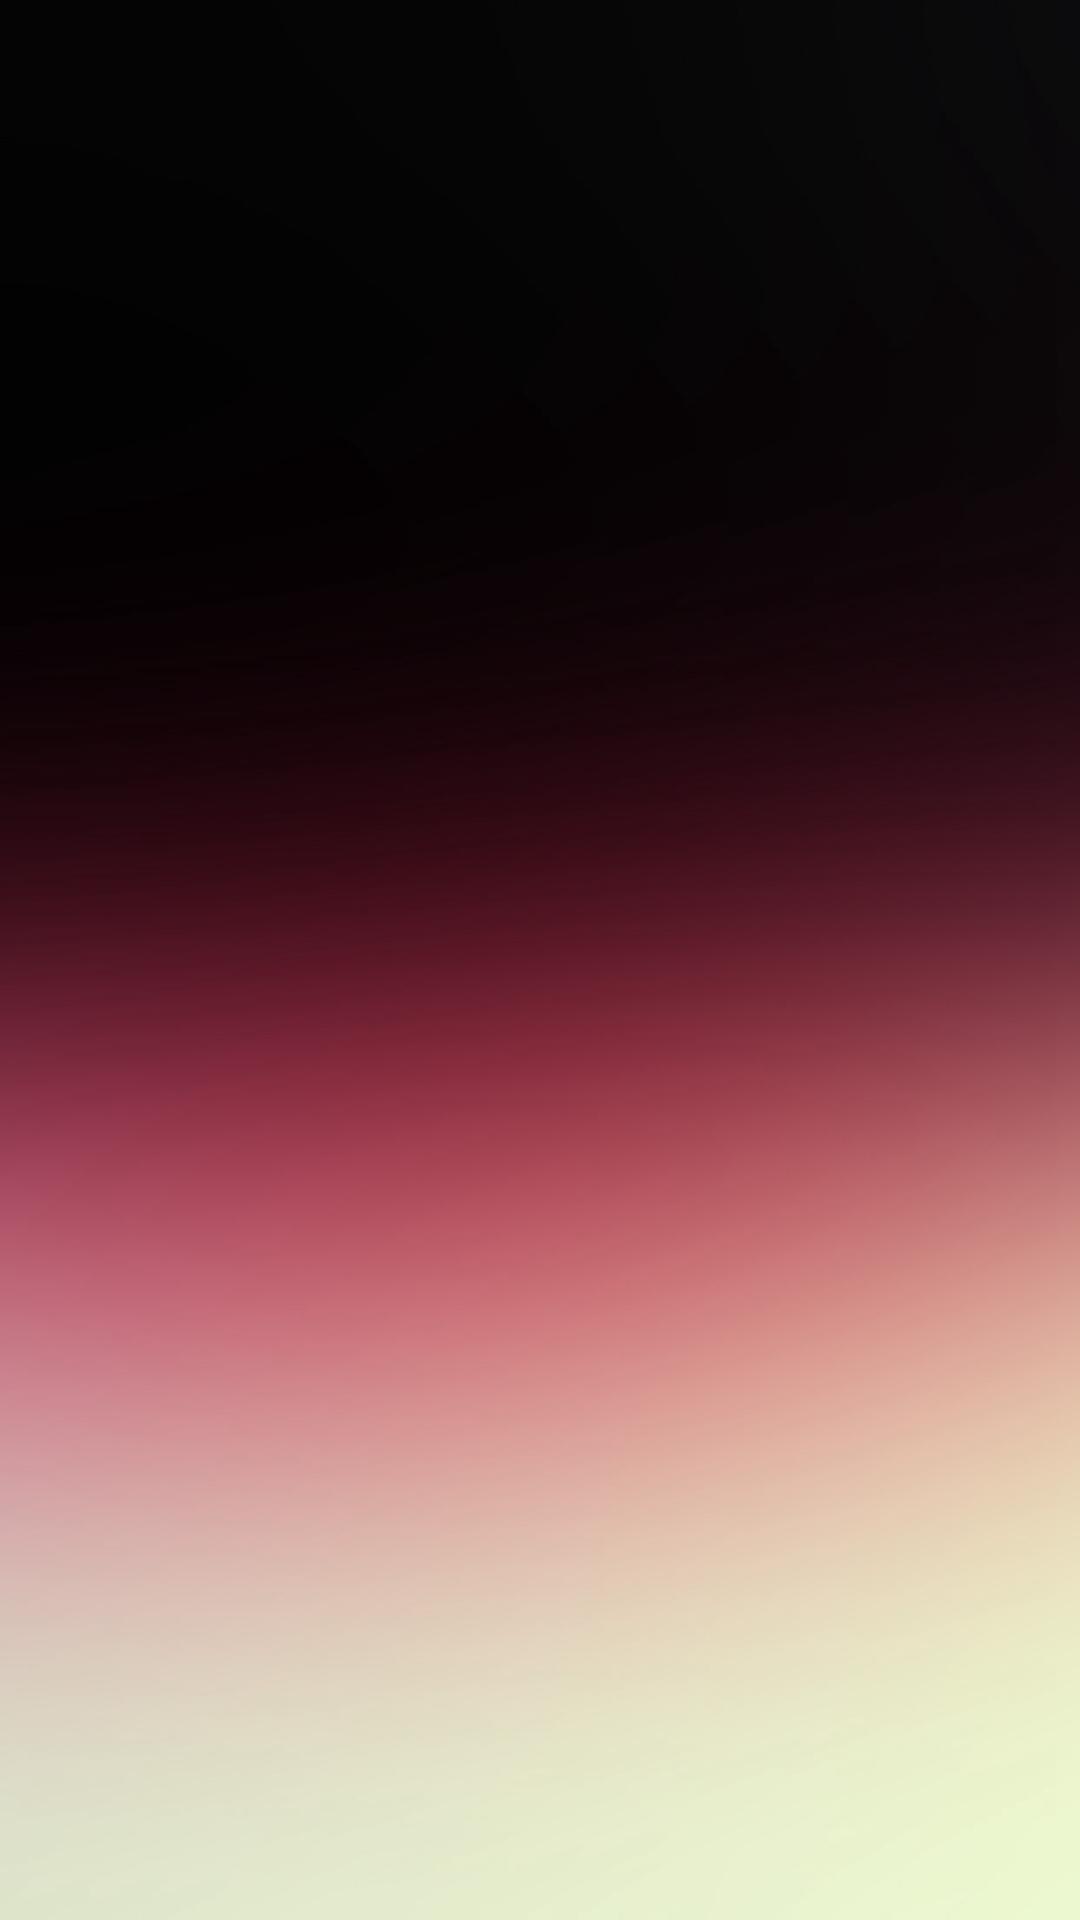 Dark-Red-Bokeh-Gradation-Blur-Pink-iPhone-wallpaper-wallpaper-wp4805771